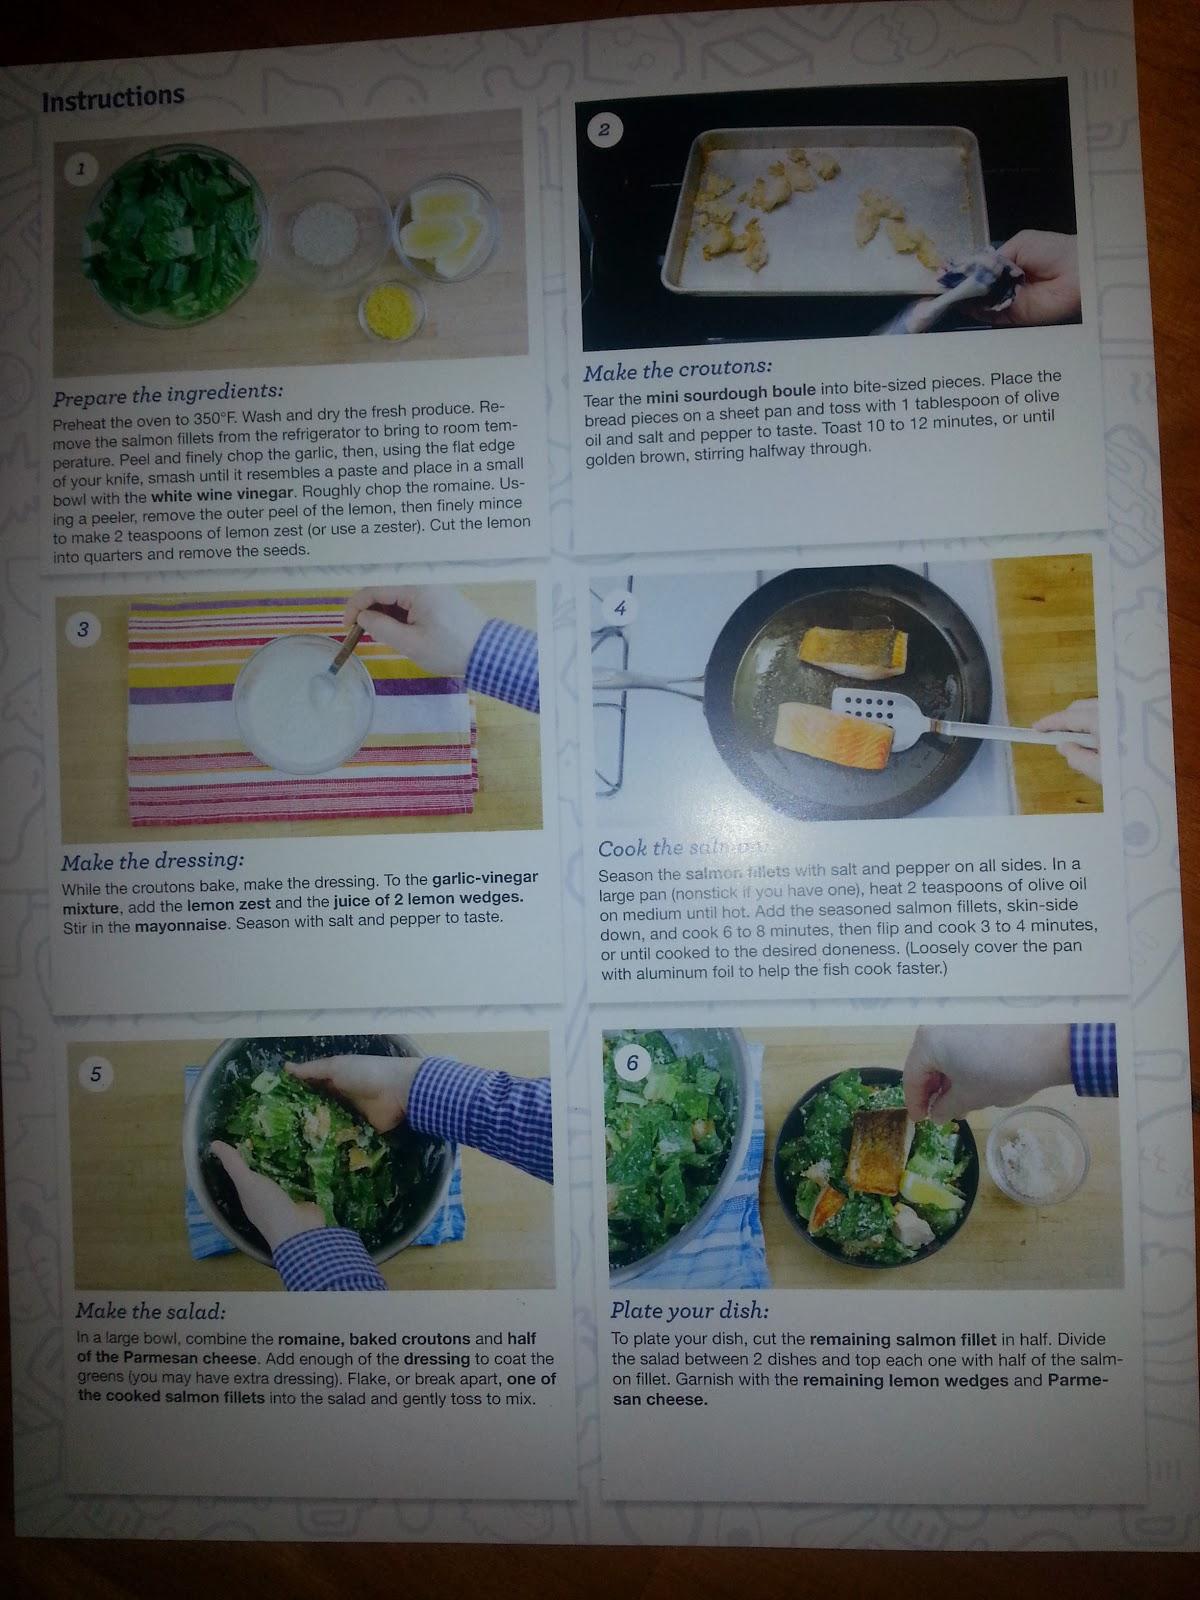 The Salmon Caesar Salad Recipe Card 20140714howtogrillwholefishvickywasik  20140724salmonsteaksvickywasik4g